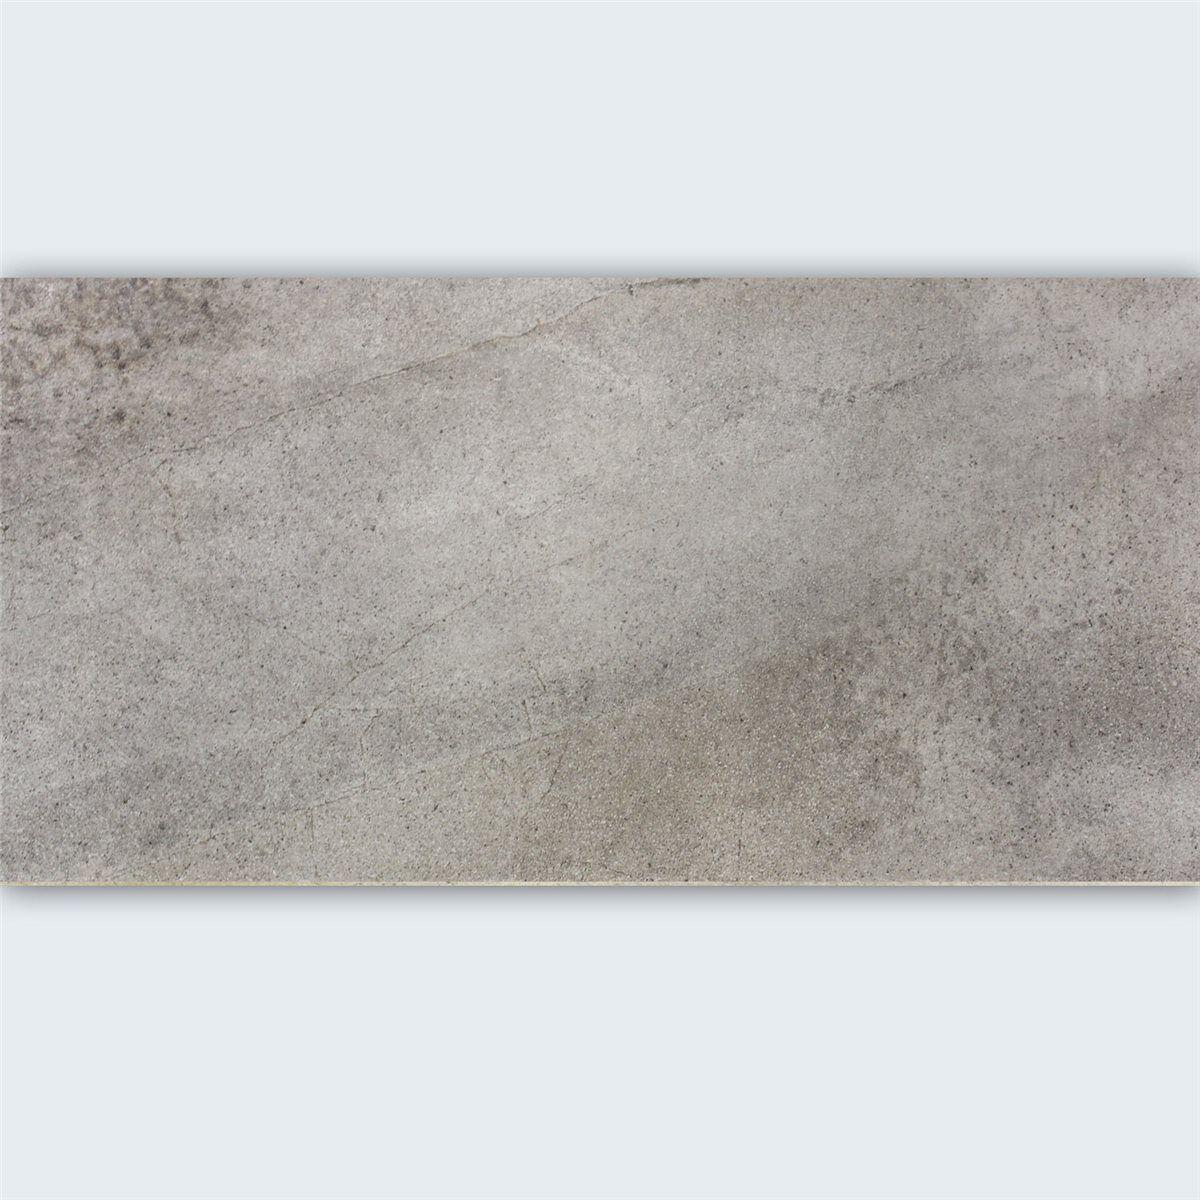 Bodenfliese Feinsteinzeug Padua Grau 30x60cm